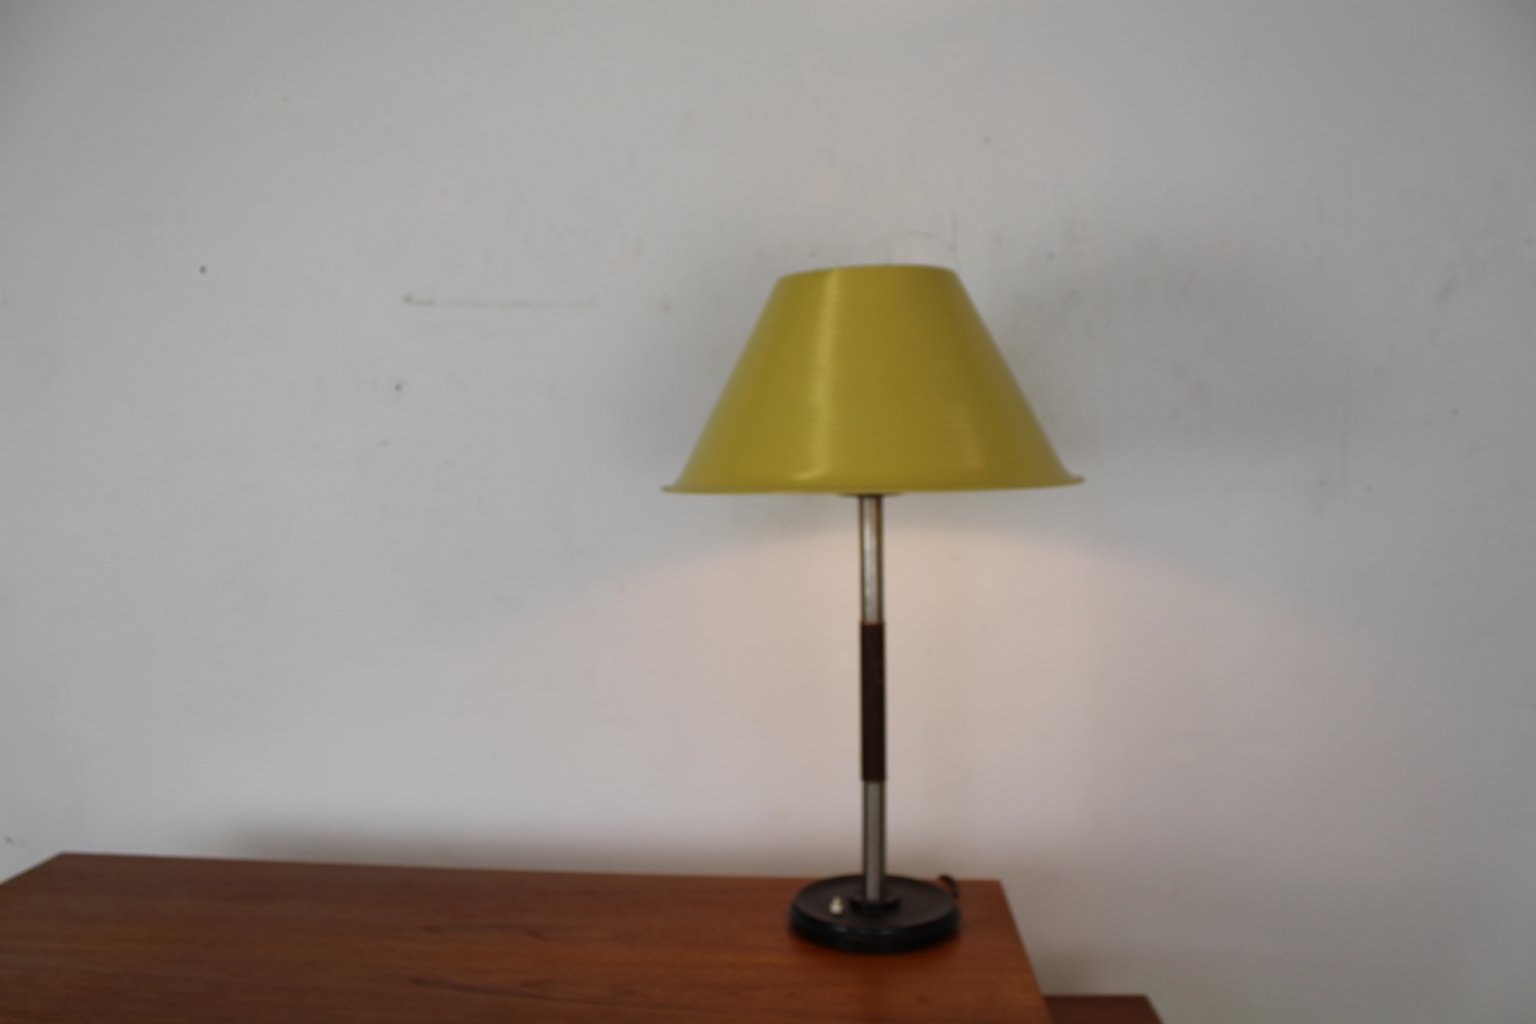 Modell 5020 Tischlampe von Gispen, 1965